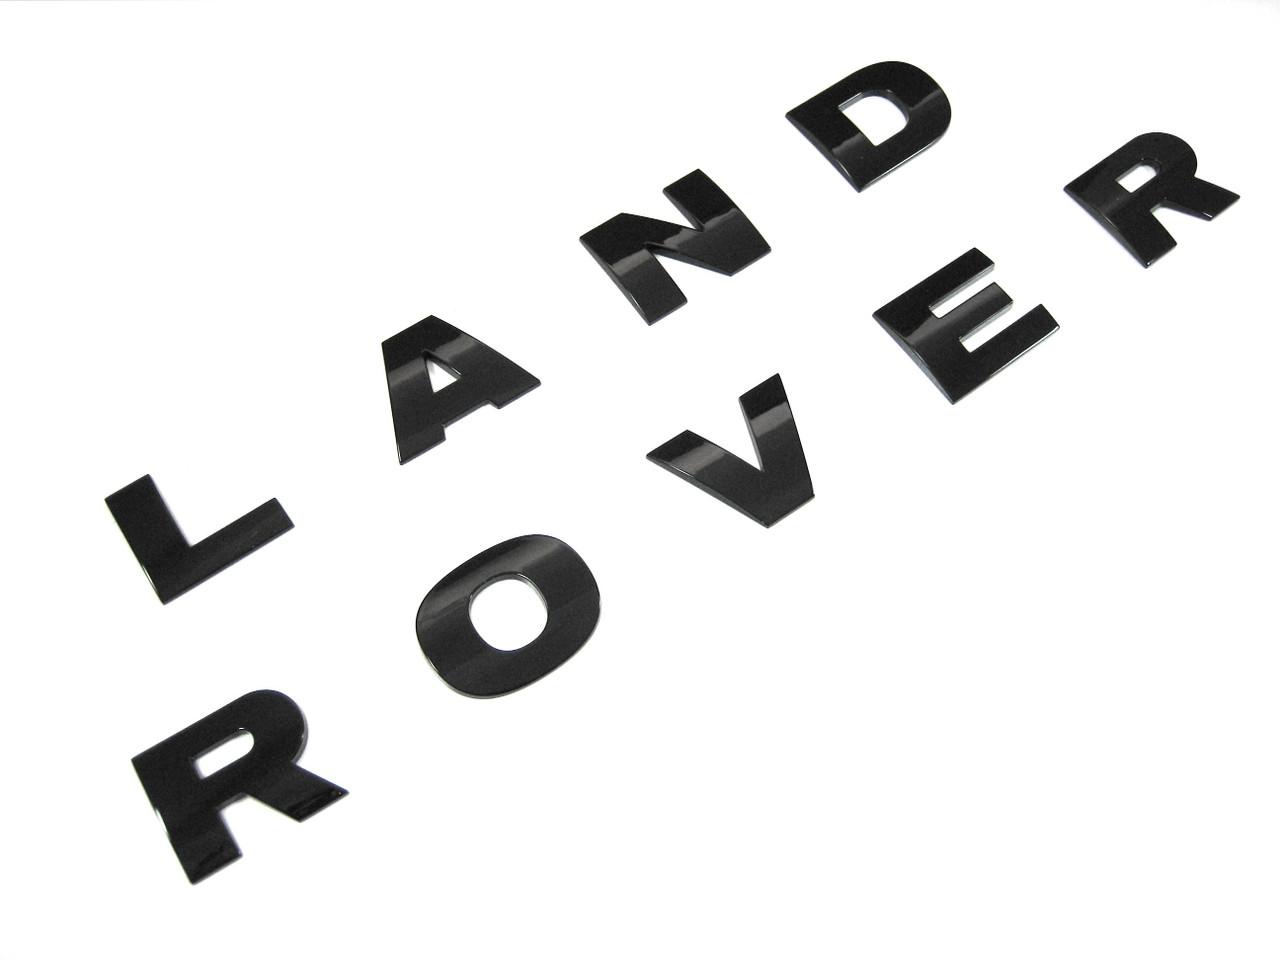 Land Rover LR4 Name Plate Tail Gate Badge Lettering Gloss Black Finish LR043123